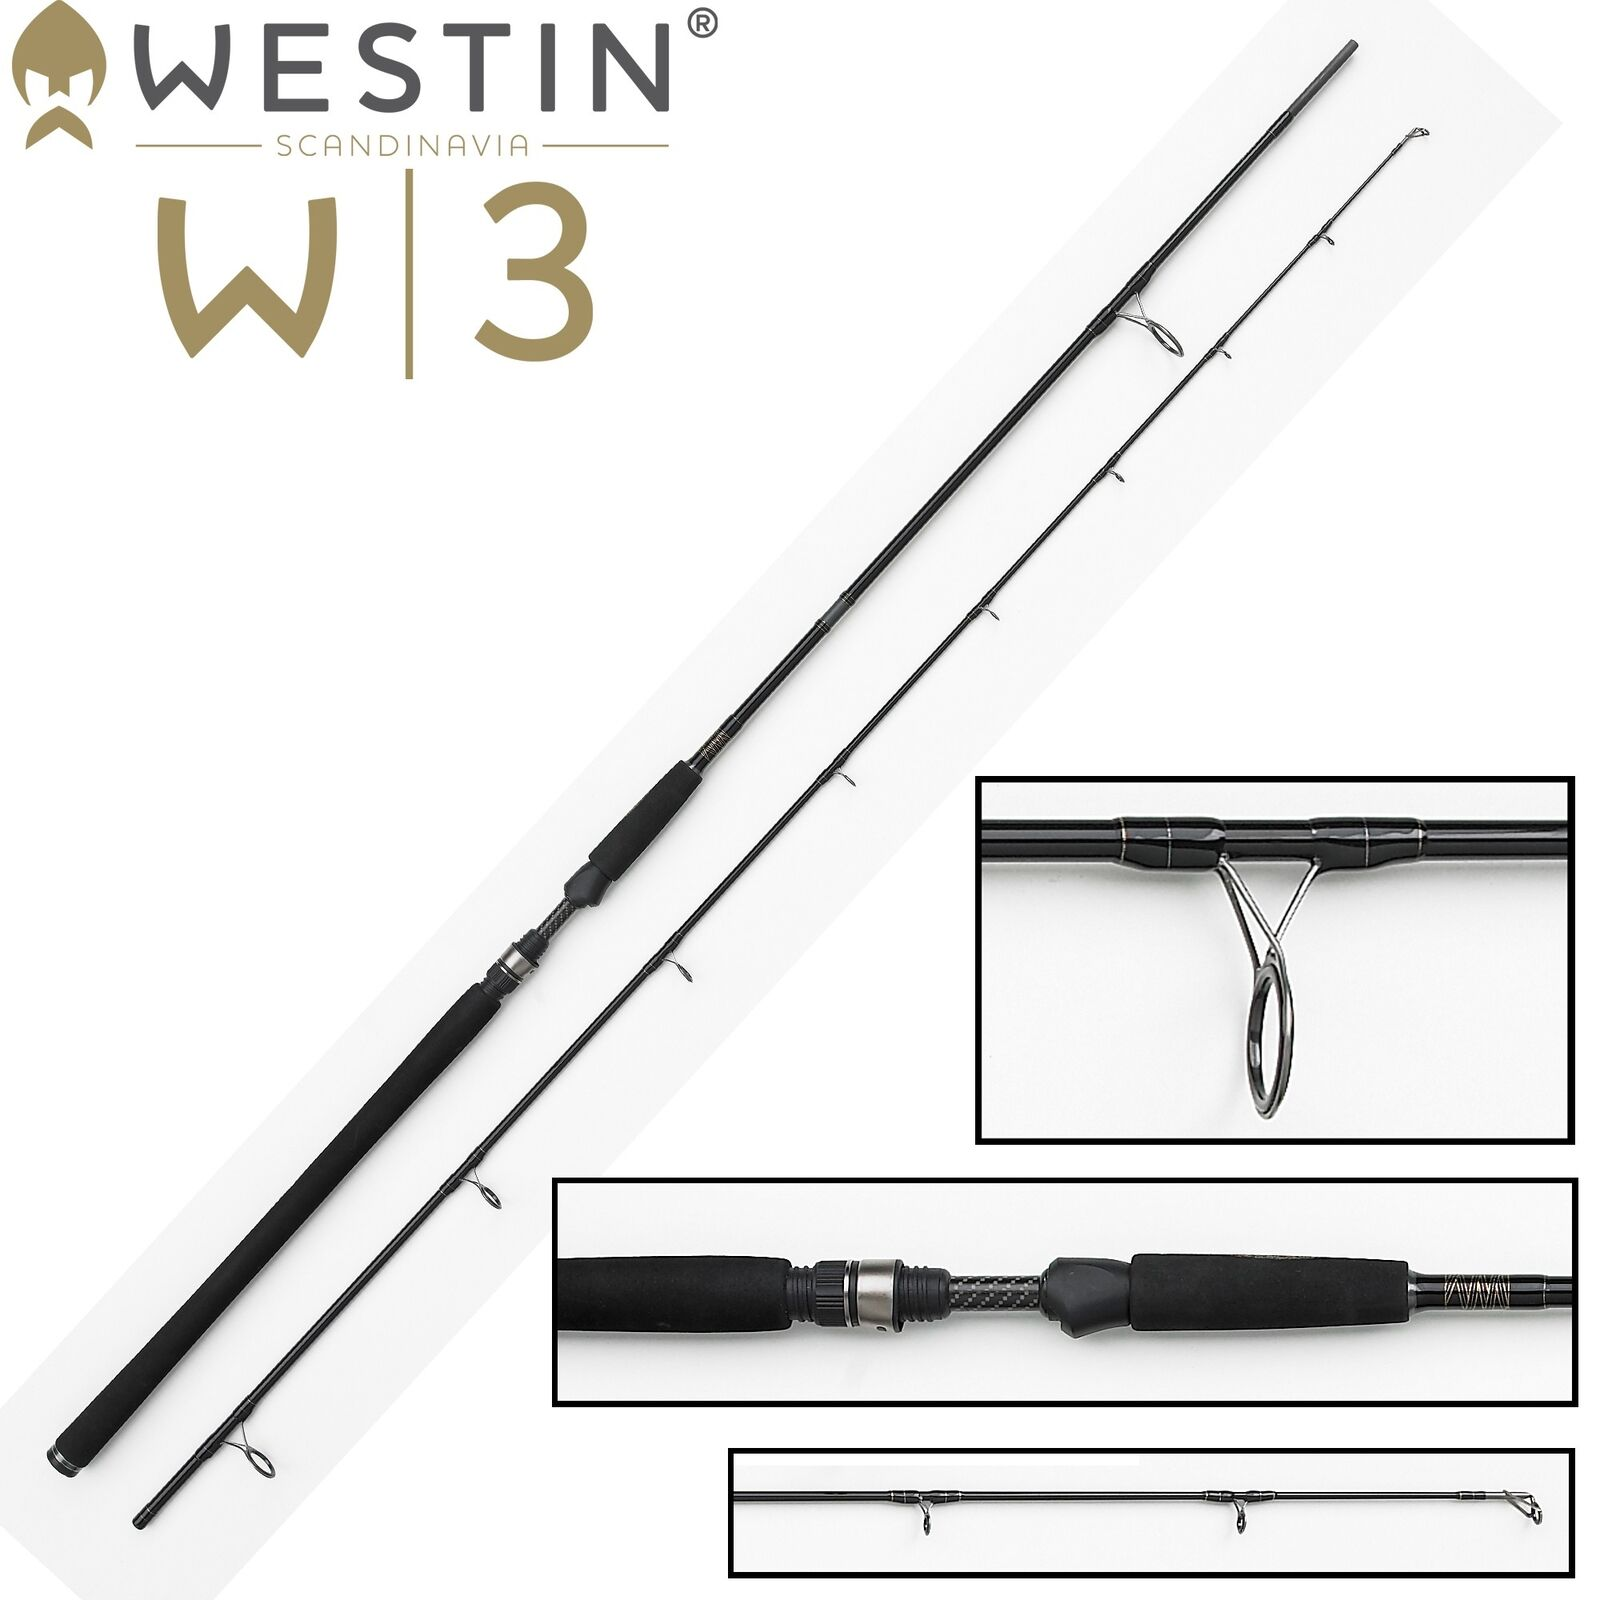 Westin W3 Powercast 278cm XXH 40-130g Spinnrute zum Hechtangeln, Blinkerrute